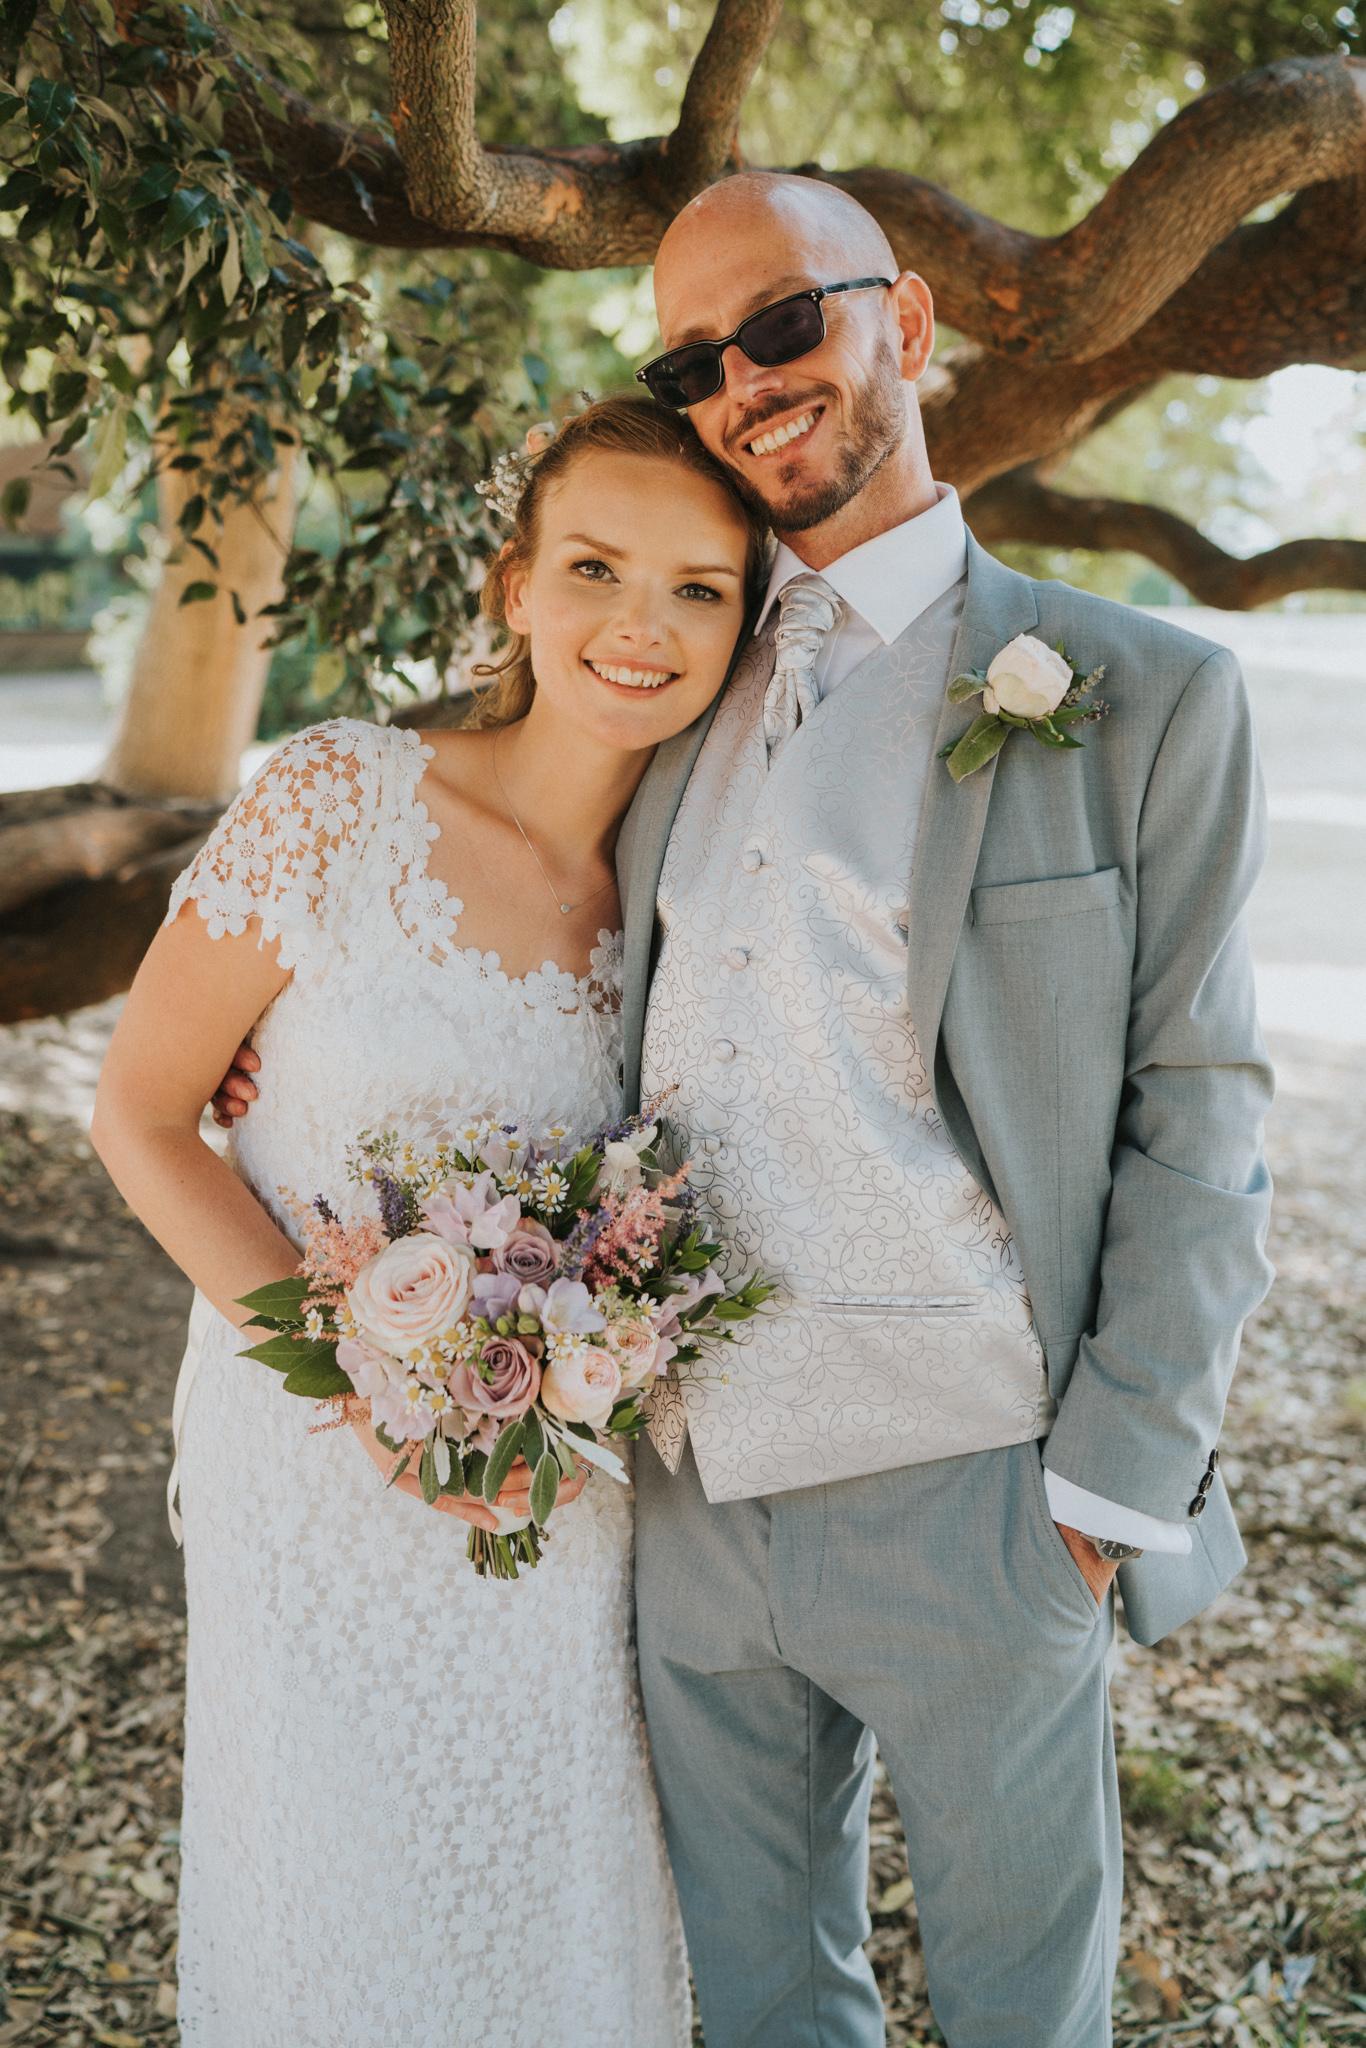 Grace-Elizabeth-Georgie-Amalaketu-Firstsite-Colchester-Essex-Boho-Buddhist-Wedding-Alternative-Wedding-Photography-Essex (93 of 100).jpg